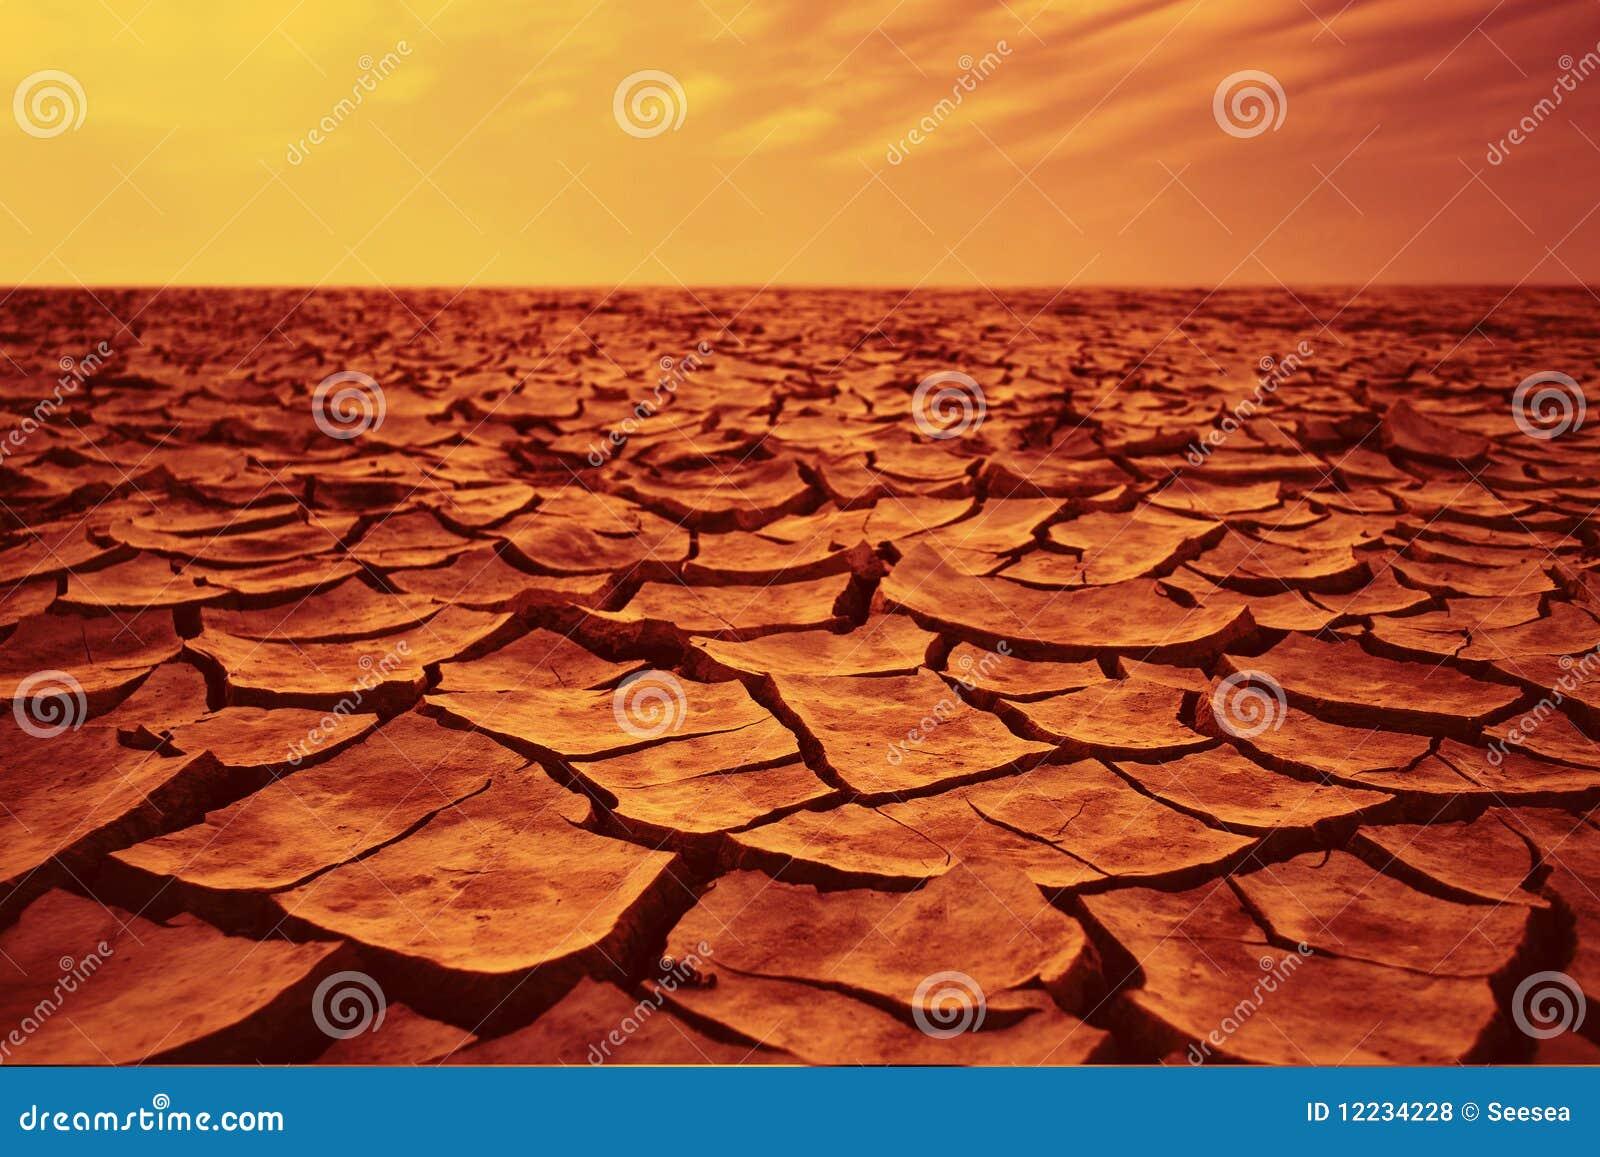 Droge woestijn